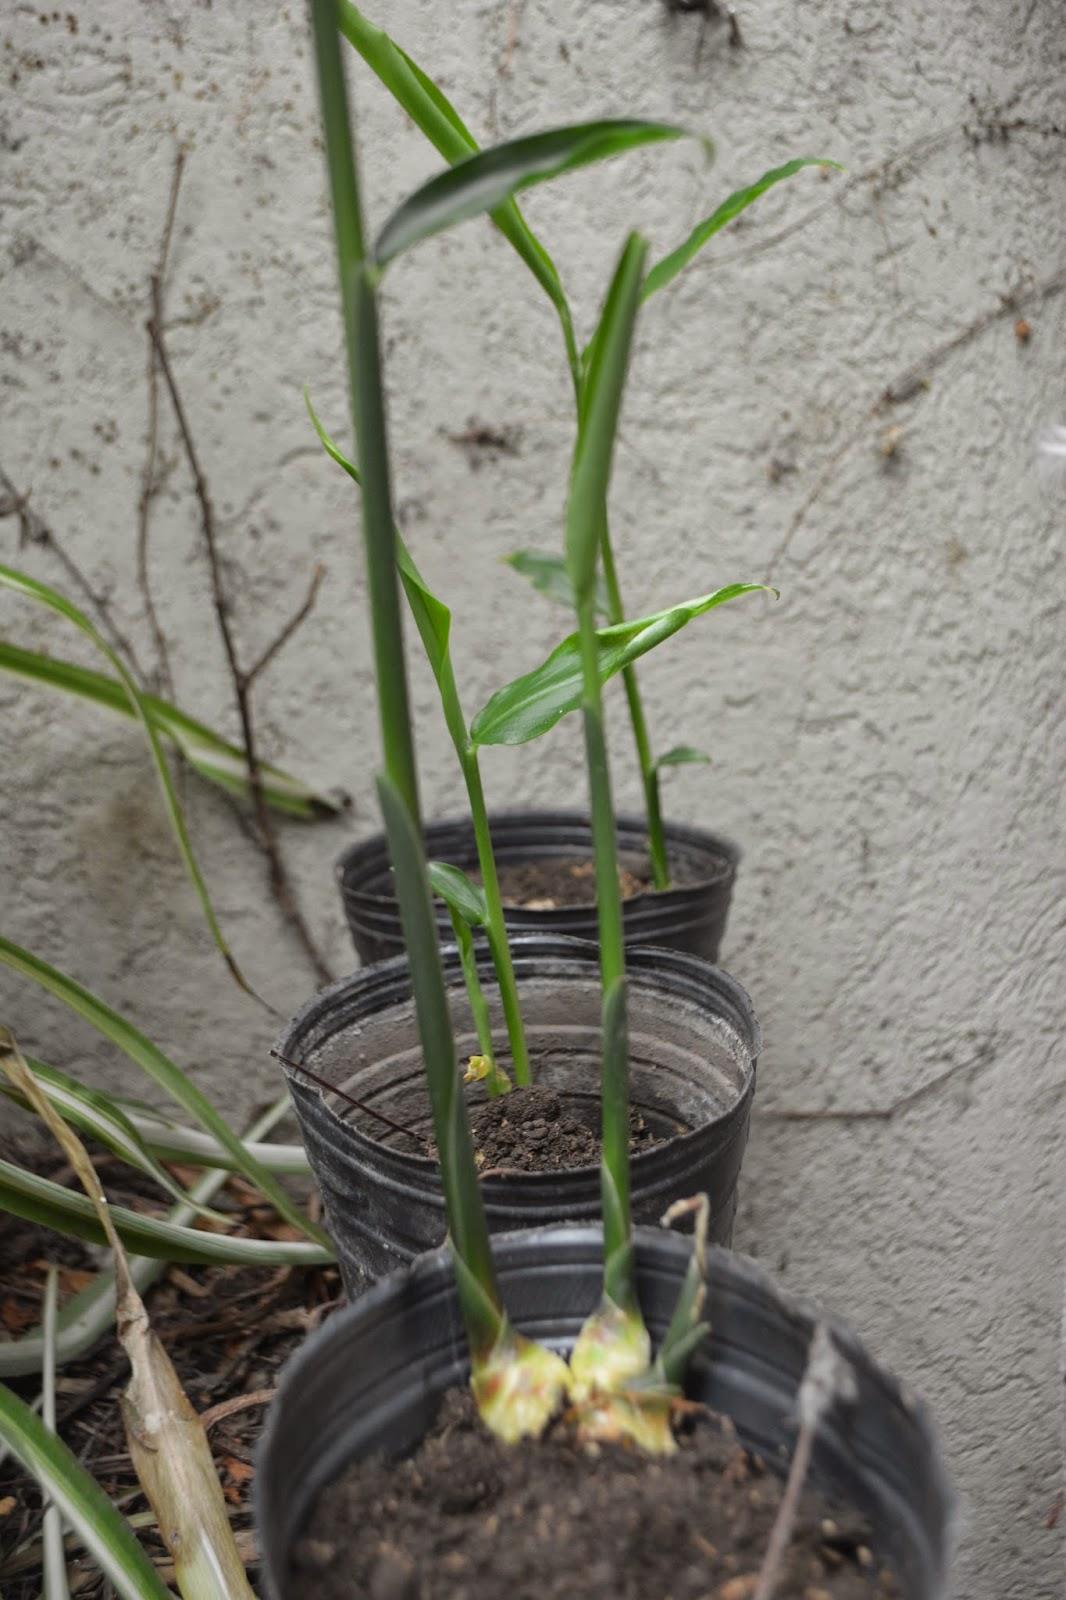 Cultivo de jengibre en maceta